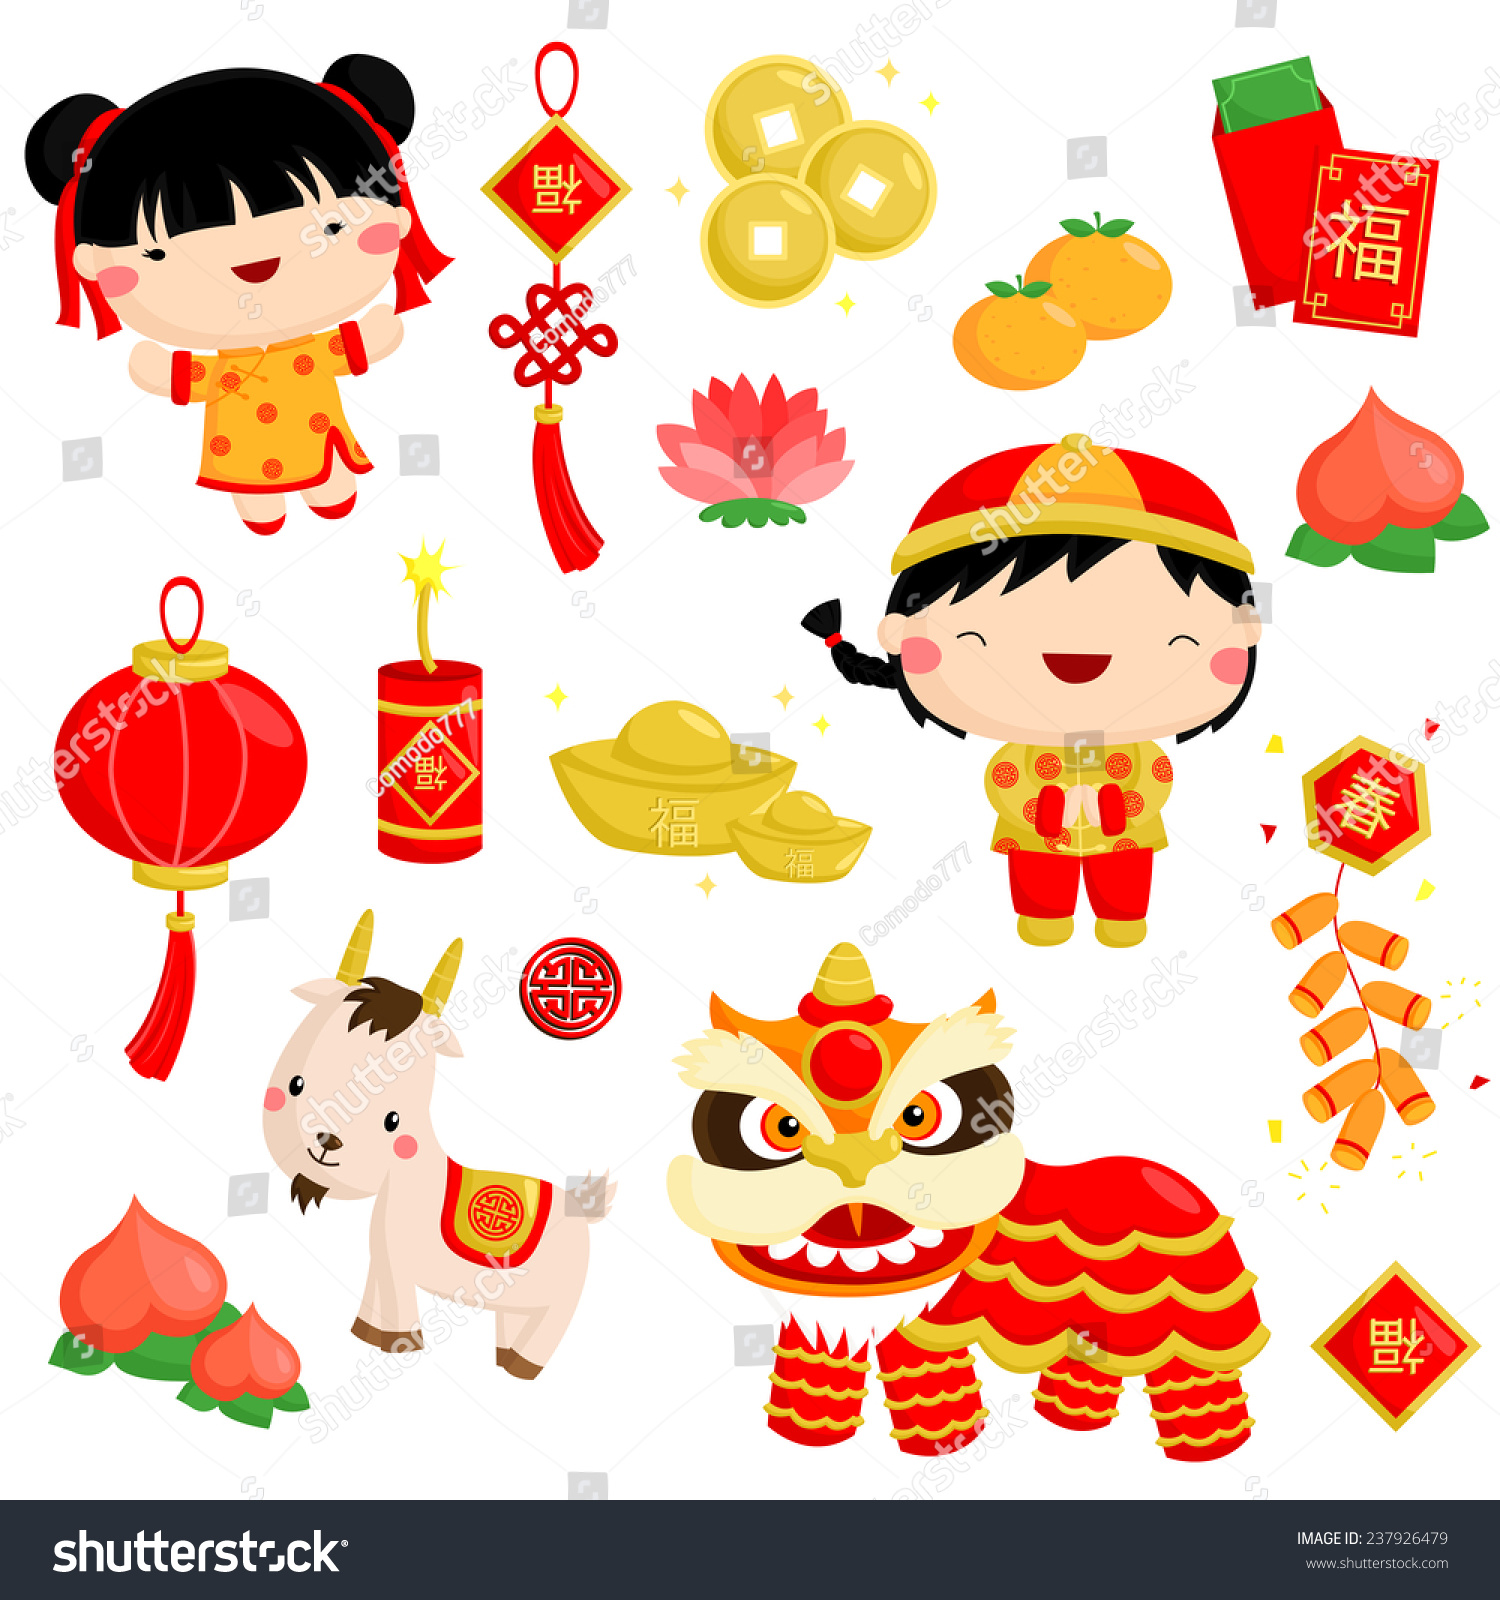 Chinese New Year Stock Vector 237926479 : Shutterstock